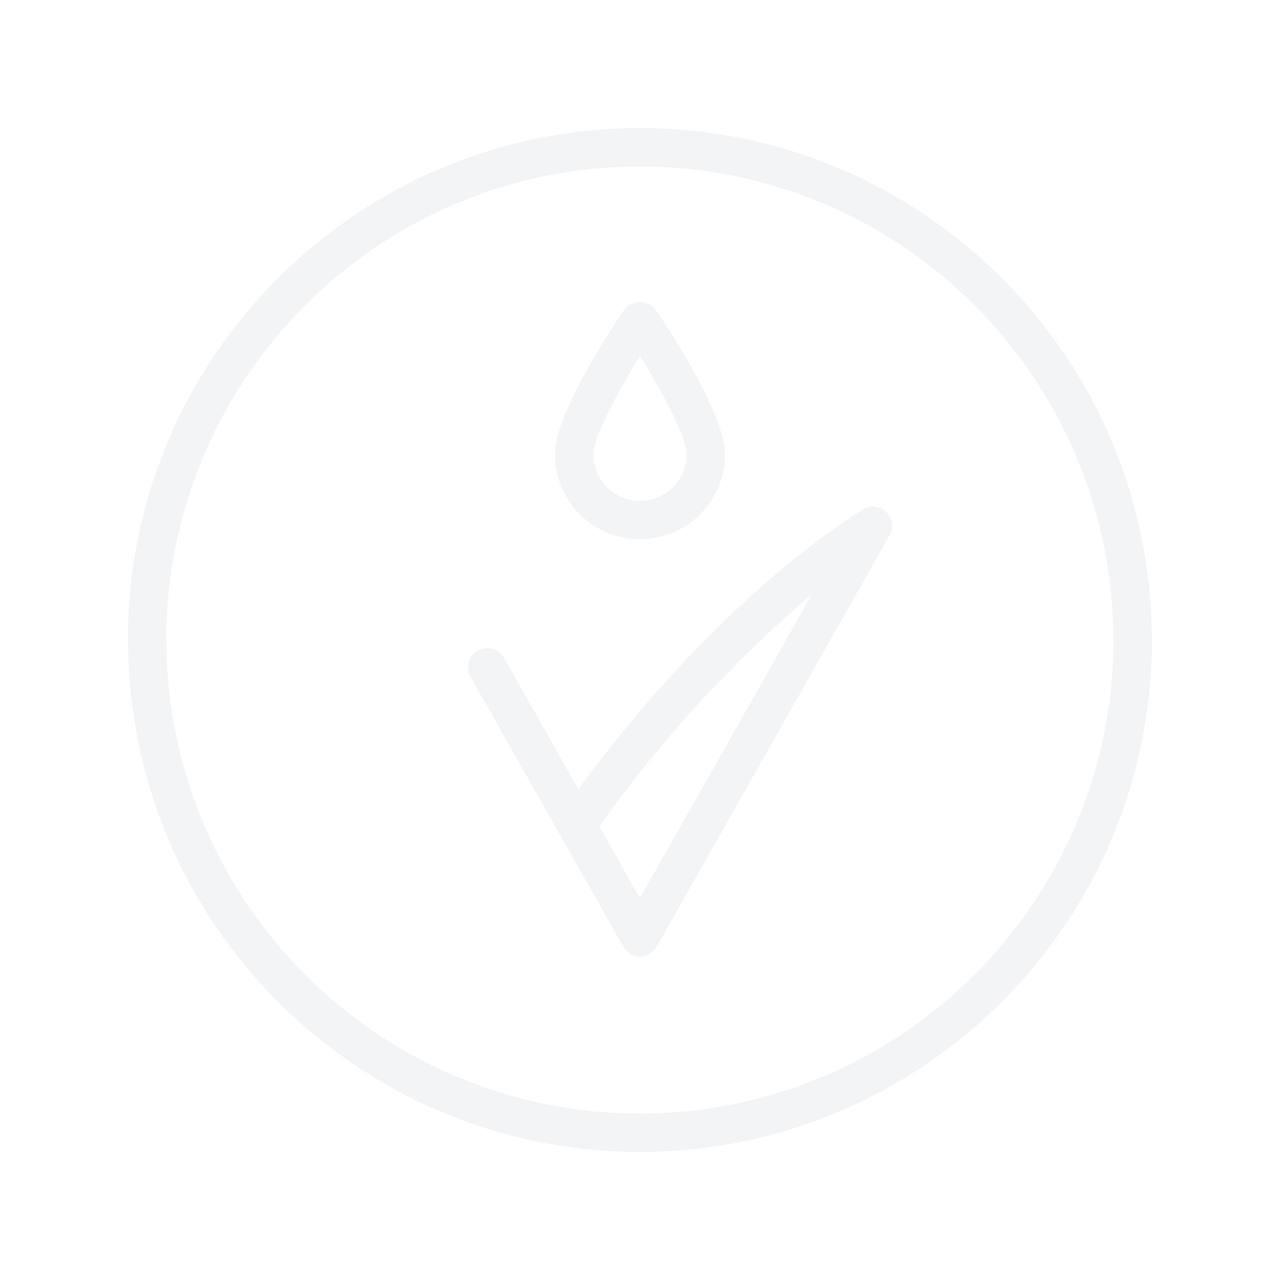 HOIA Shimmering Lip Balm 4.5ml